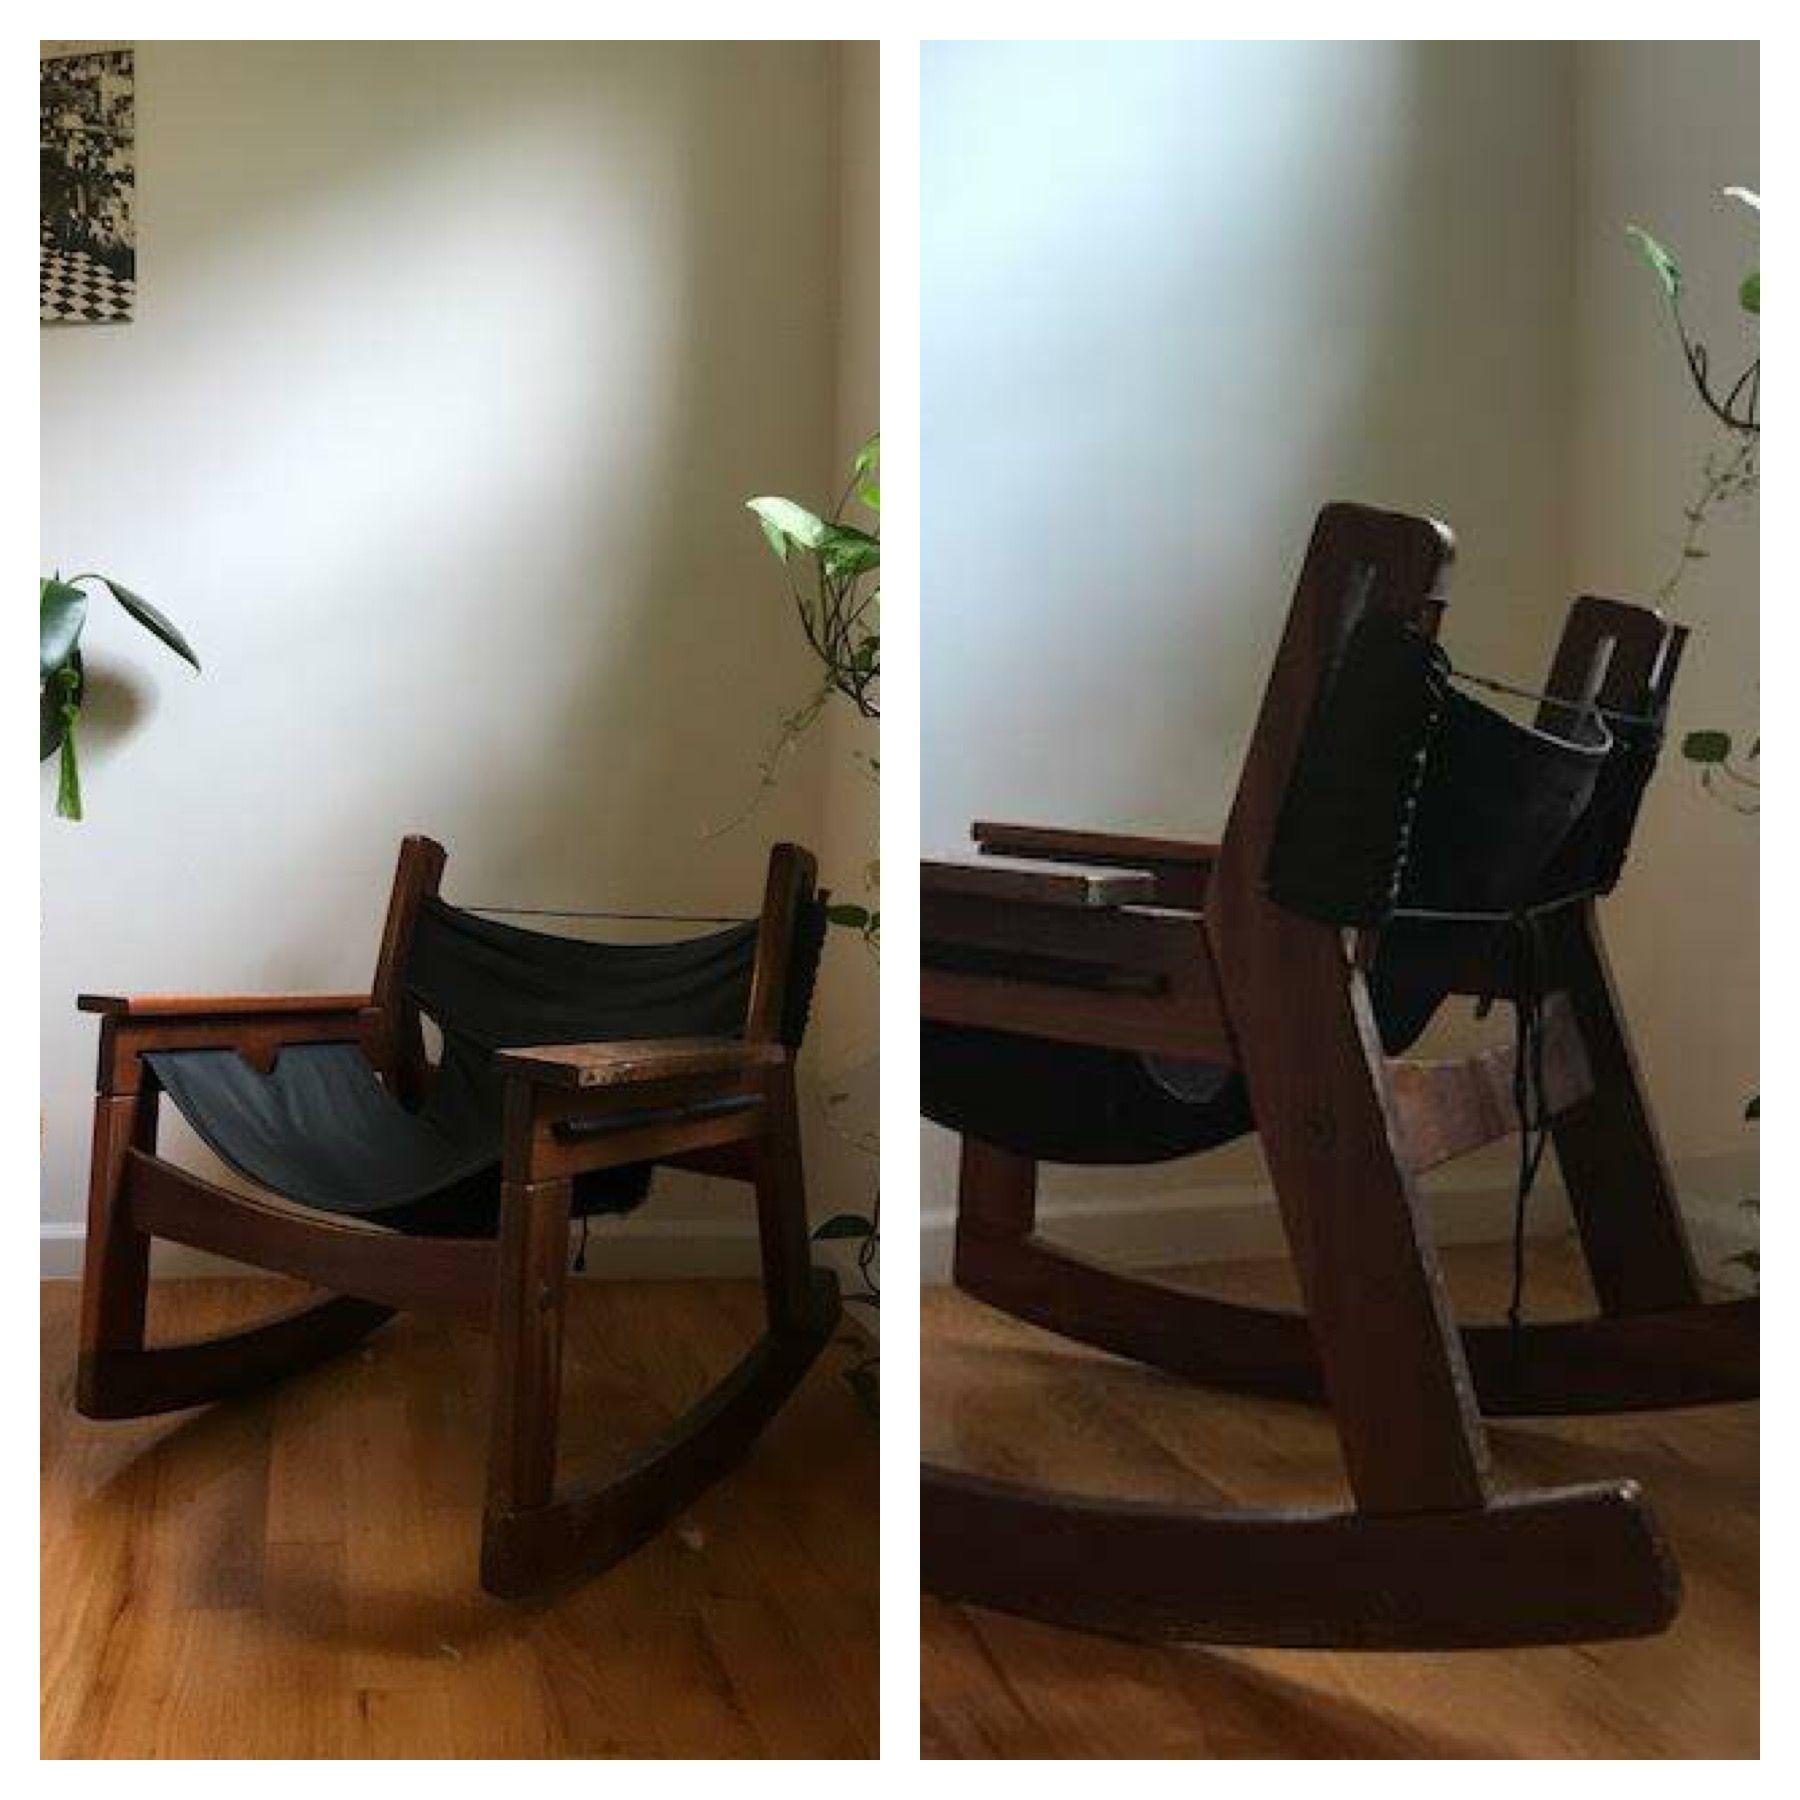 Gelli Indústria de Móveis Rocker / Rocking chair 1960s